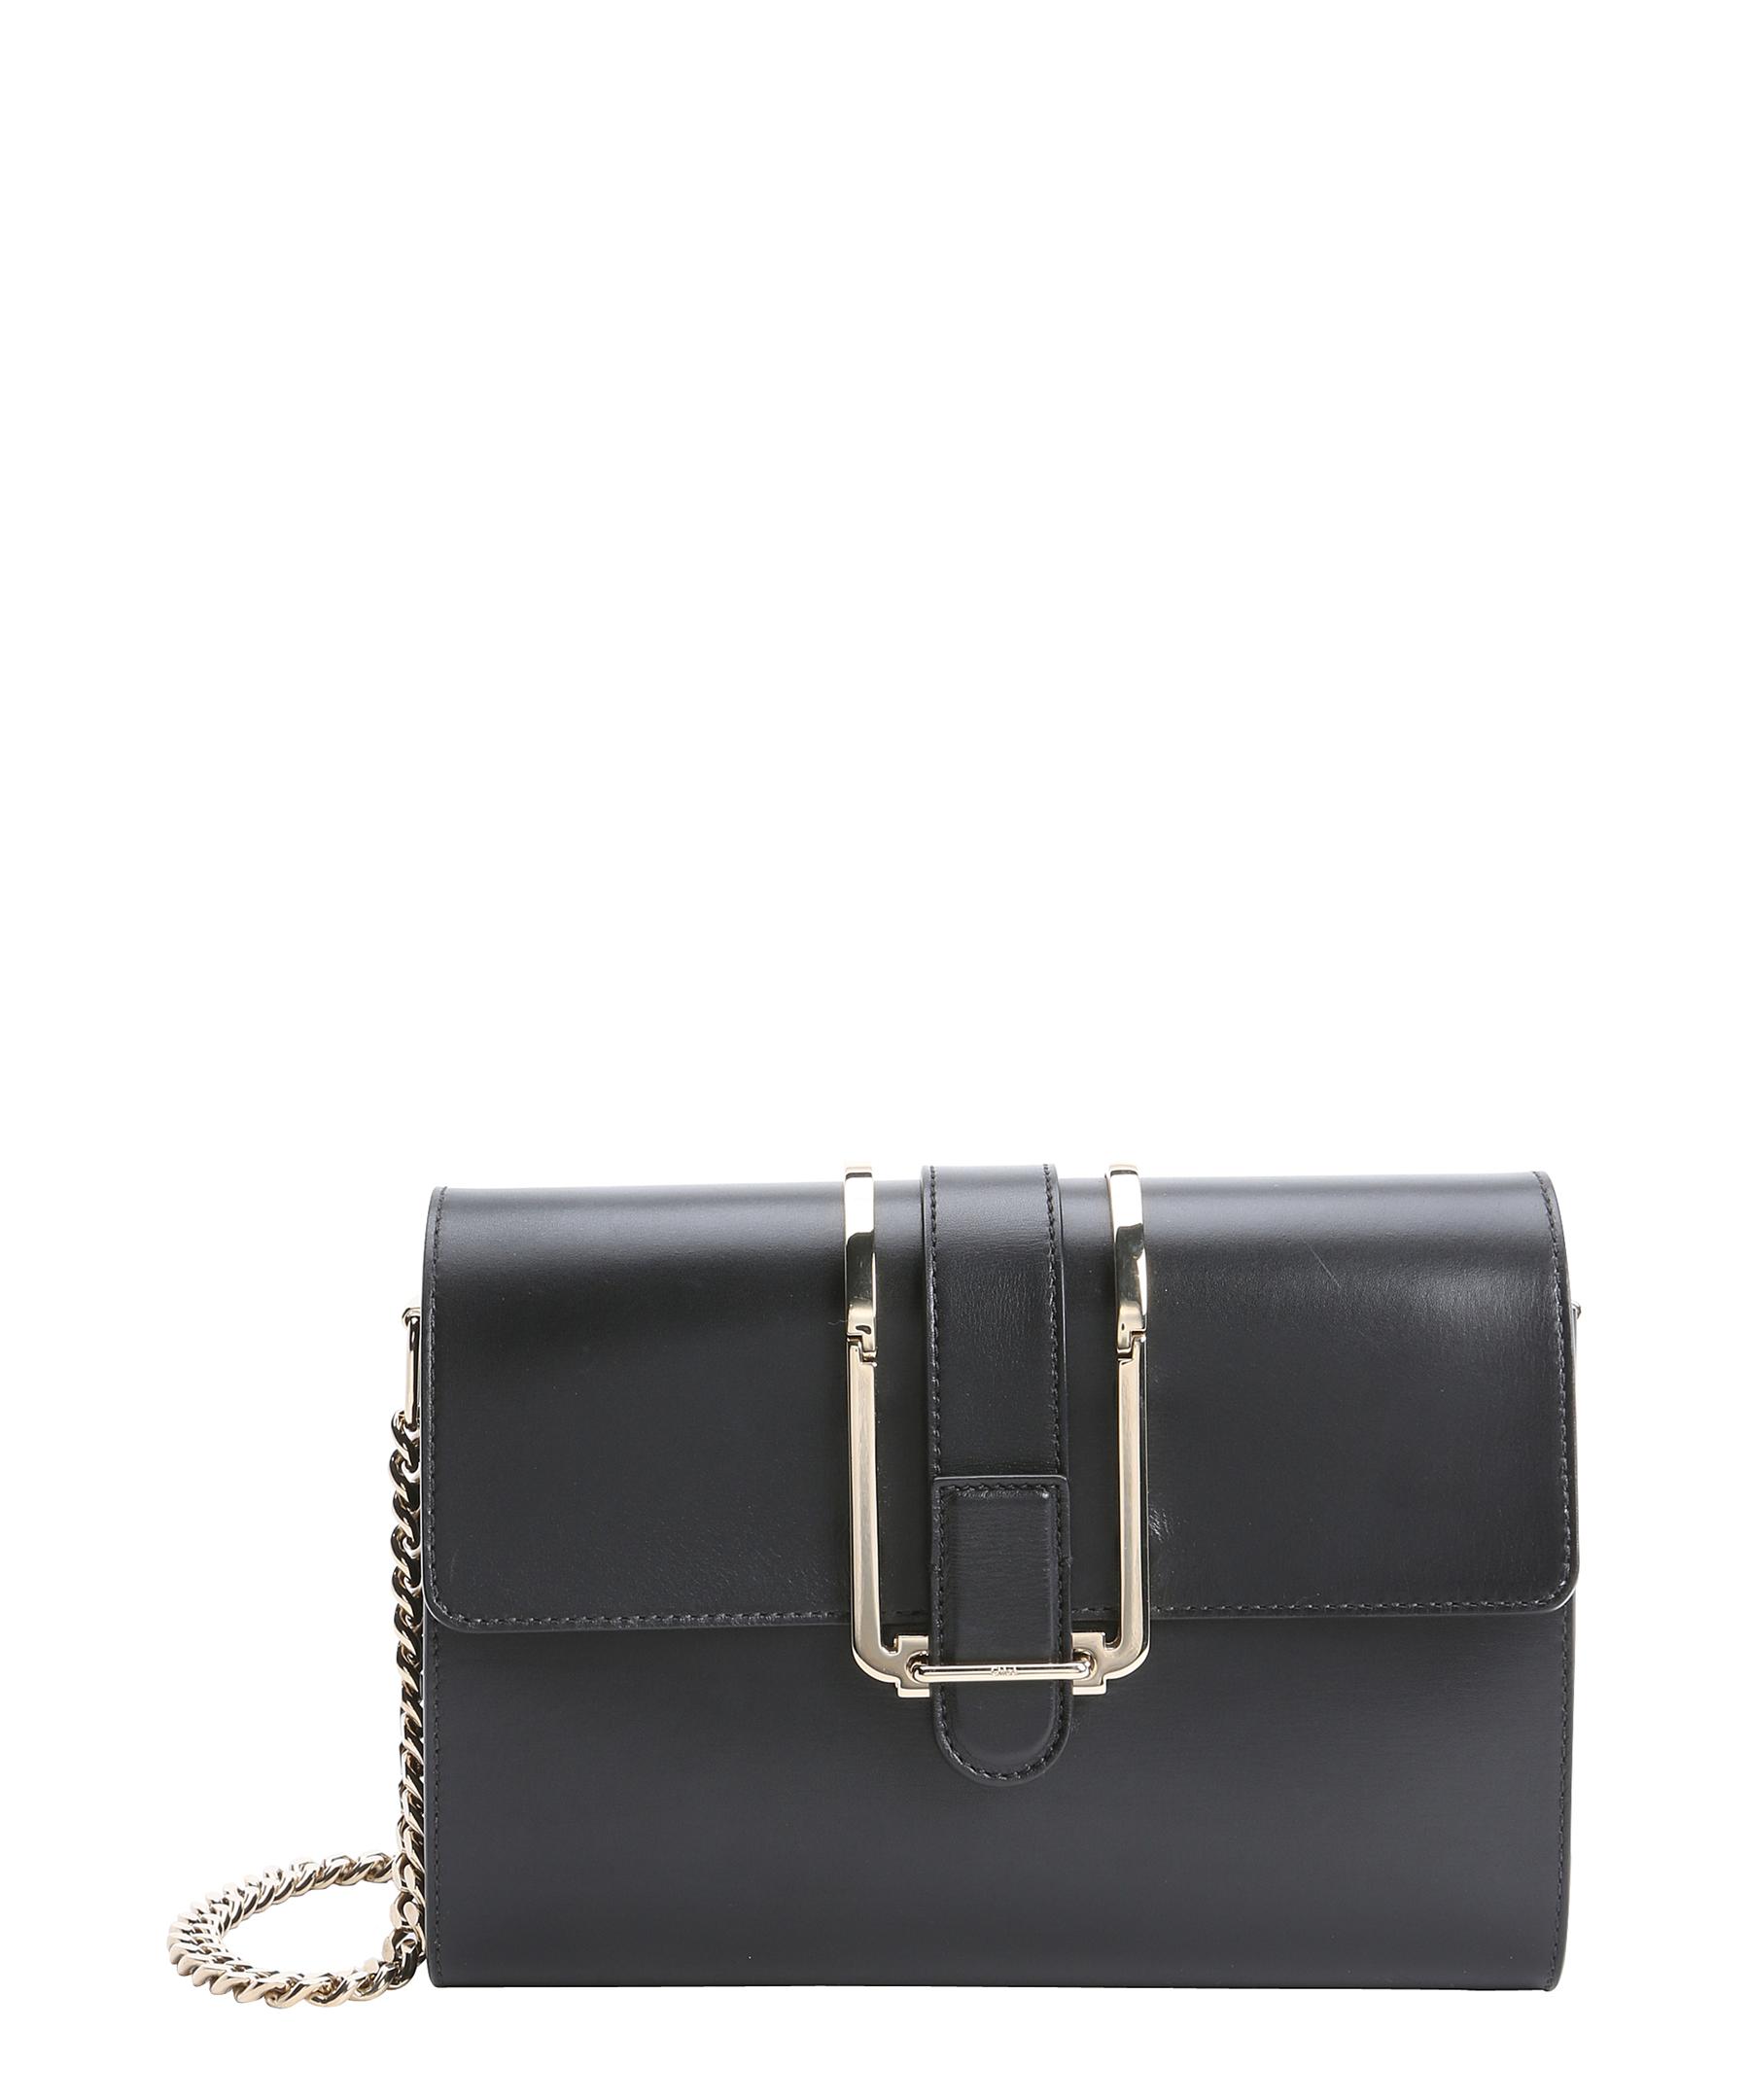 Chlo�� Black Leather \u0026#39;bronte\u0026#39; Small Shoulder Bag in Black | Lyst